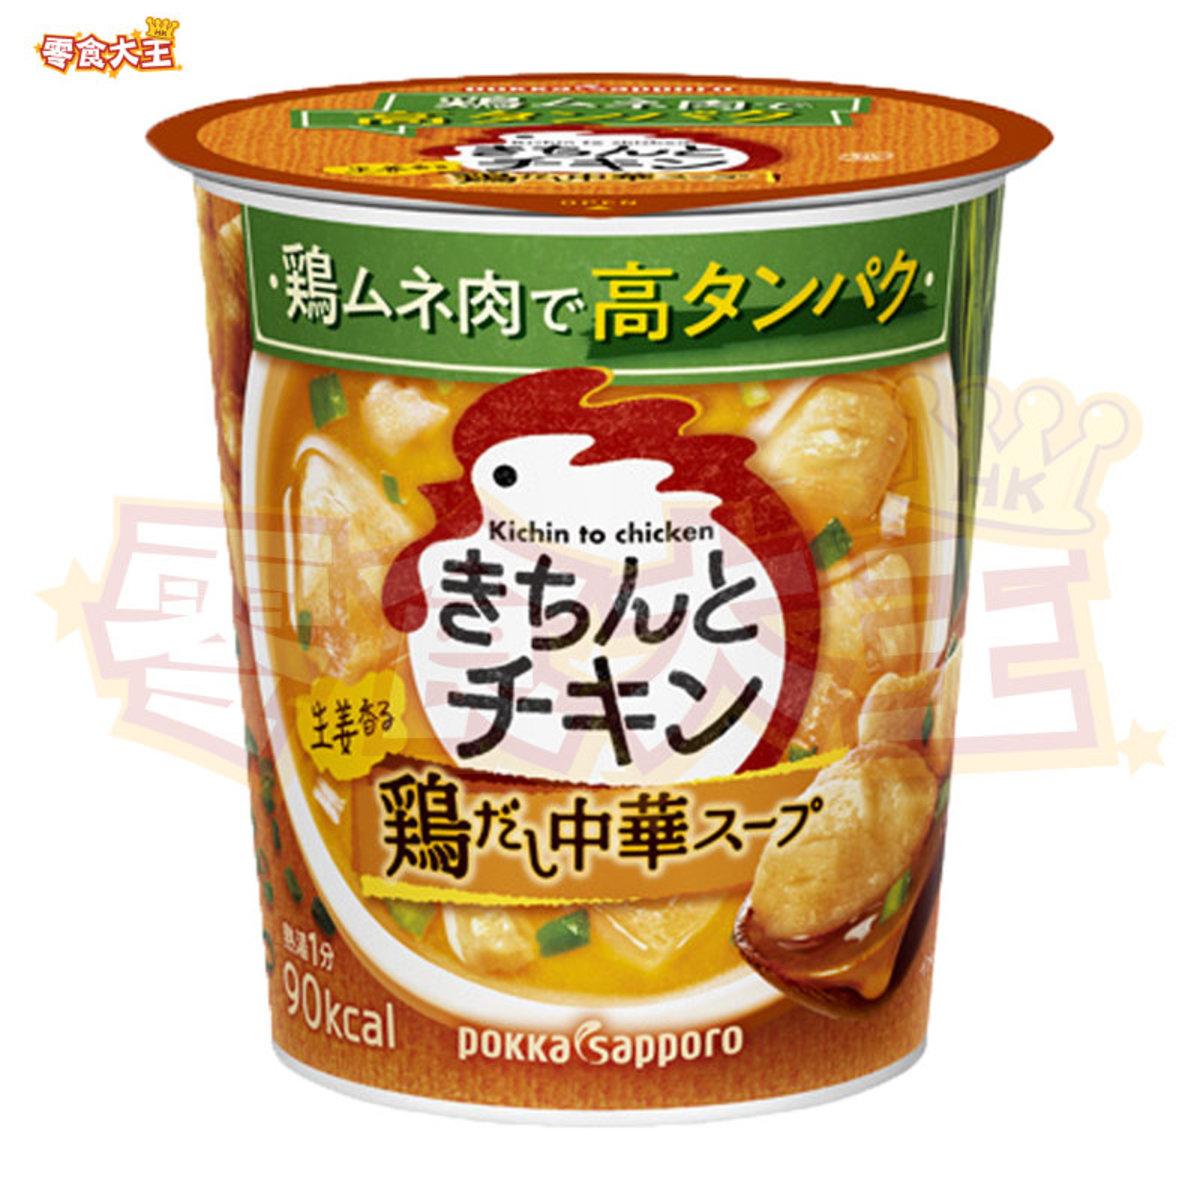 Kichin To Chicken Chicken Broth Chinese Soup 23g (4589850823985)